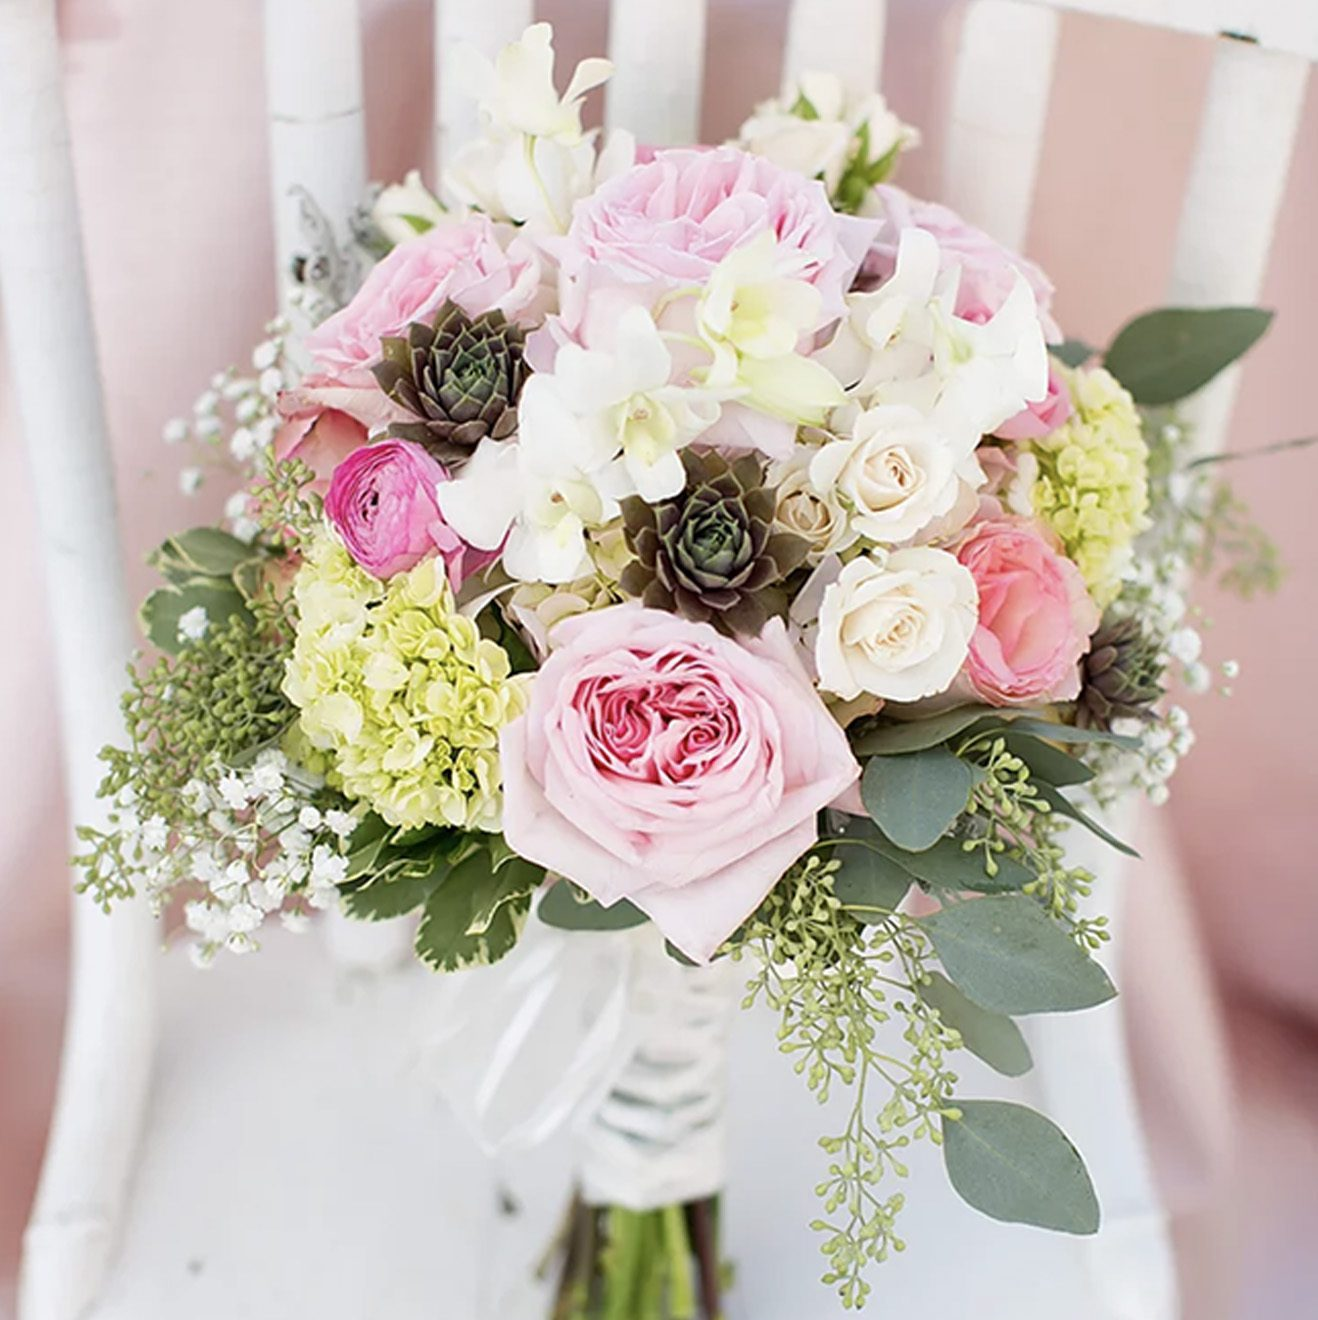 wedding bouquet of bride sitting on chair